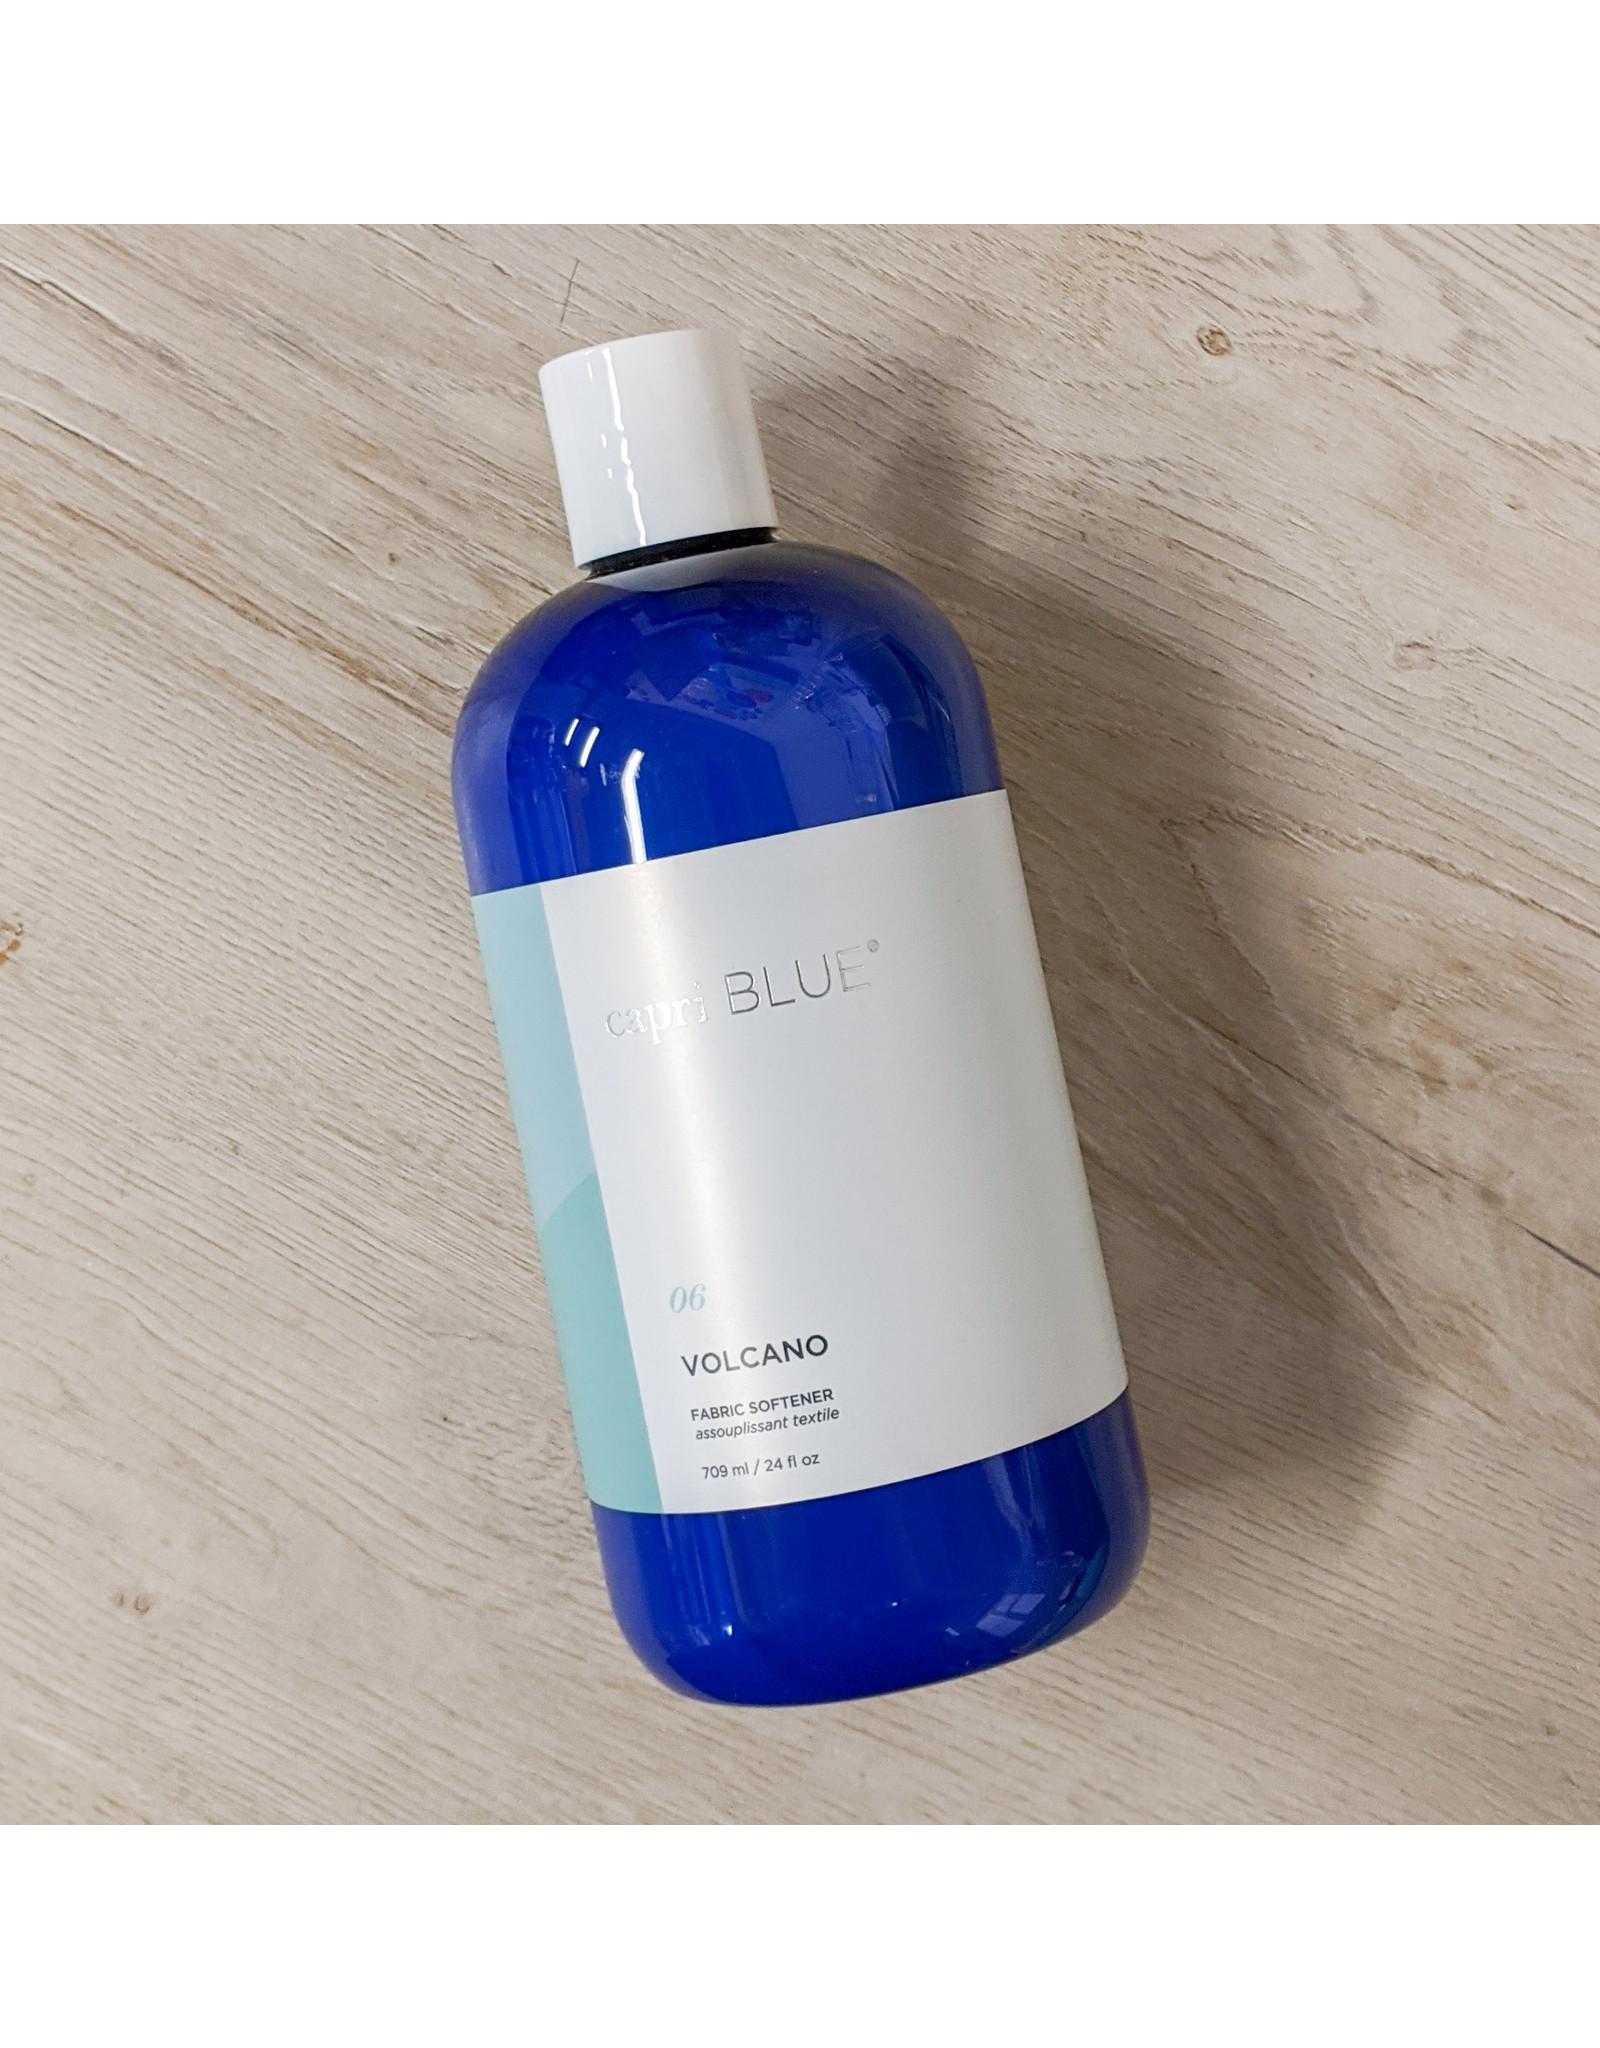 Capri Blue Fabric Softener Volcano 24oz